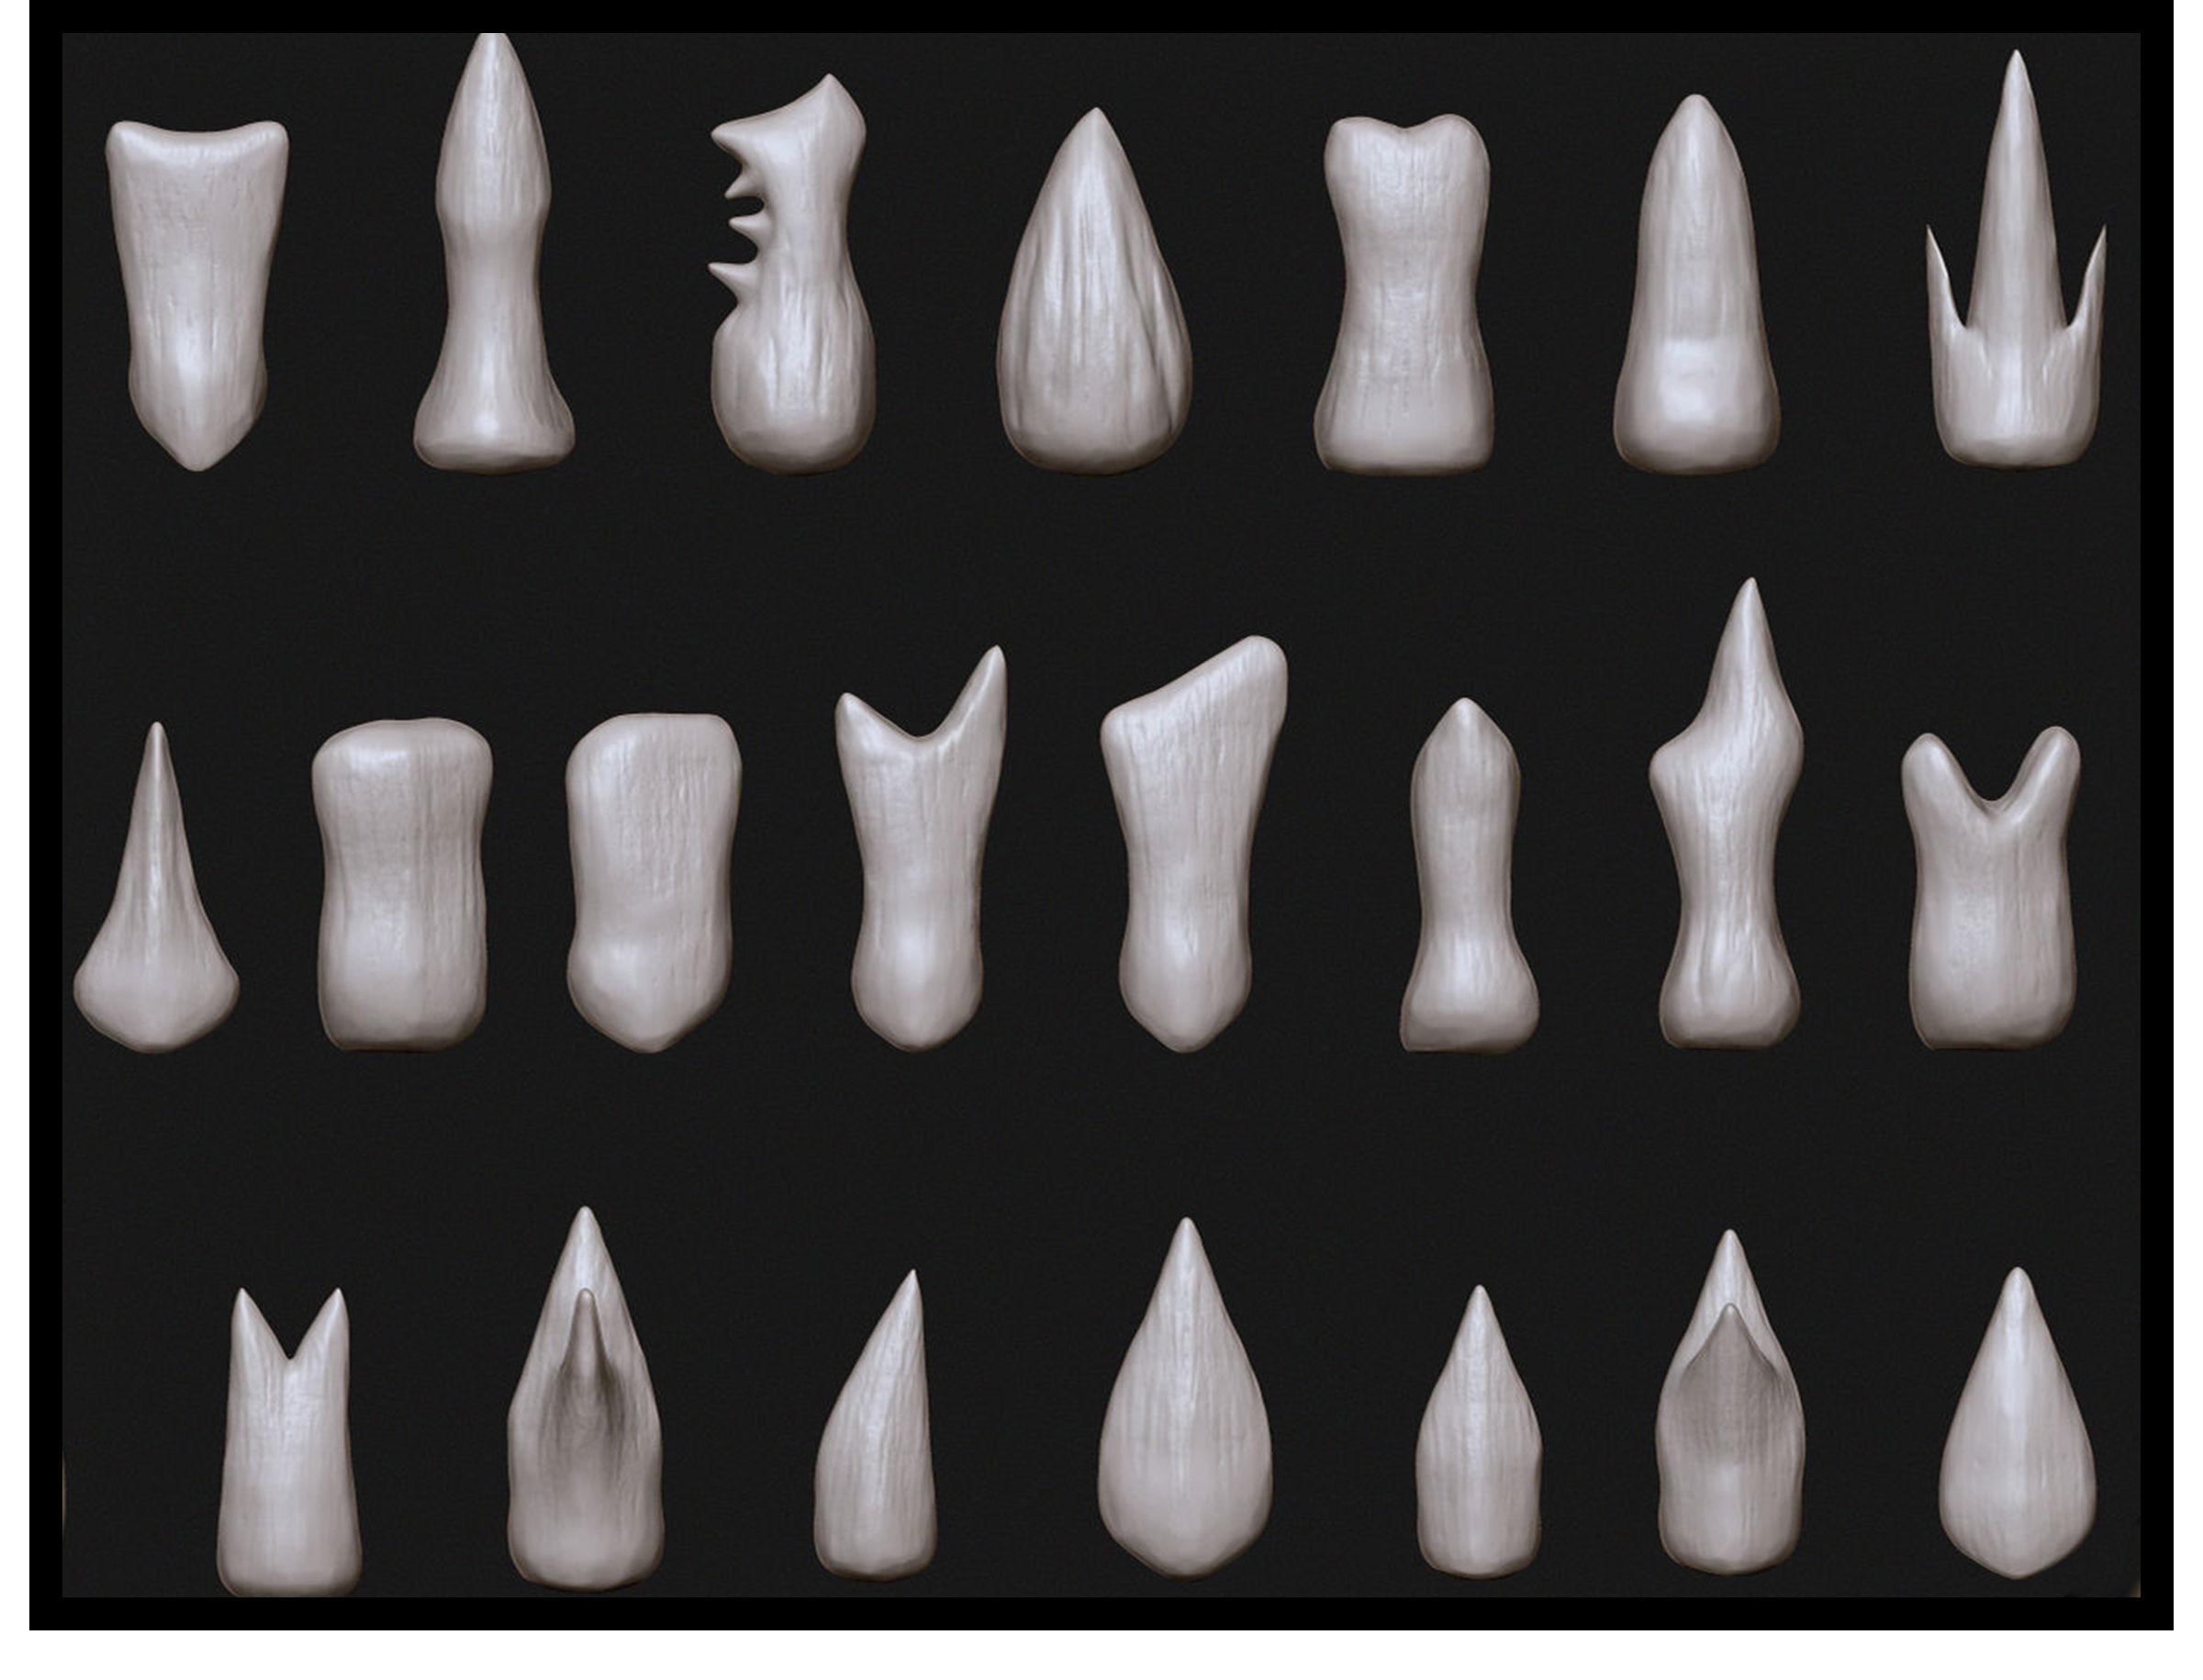 SFDEMIR Teeth IMM Brushes